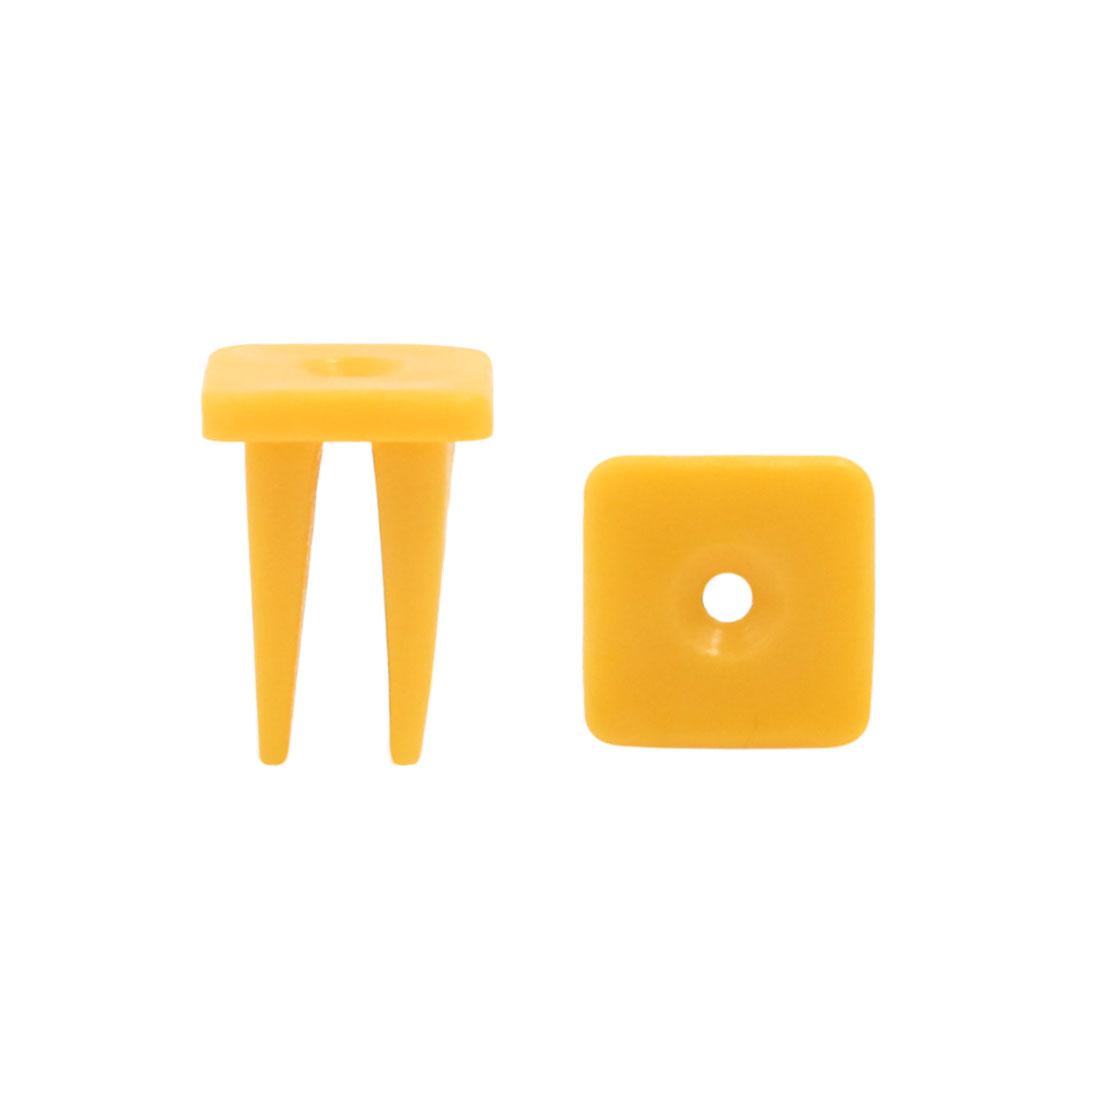 100Pcs Yellow Plastic Rivet Door Trim Panel Hood Moulding Clips 8 x 8mm for Car